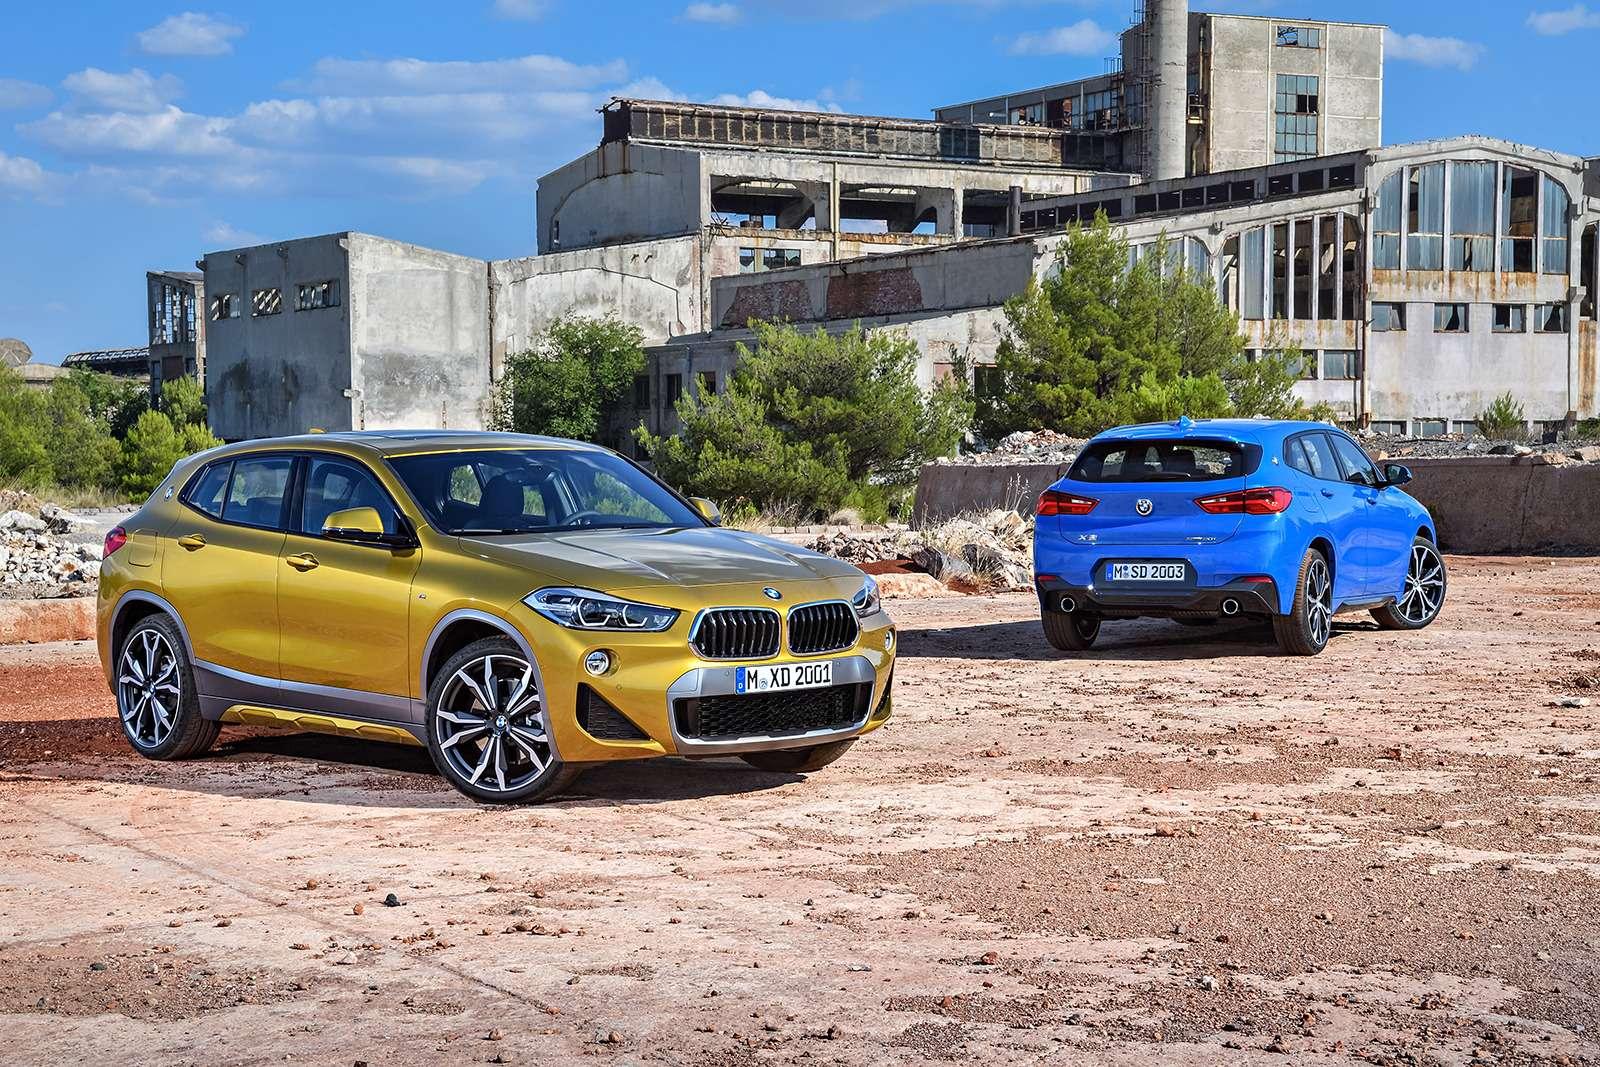 Мал, даудал: BMW рассекретила кроссовер X2— фото 809840